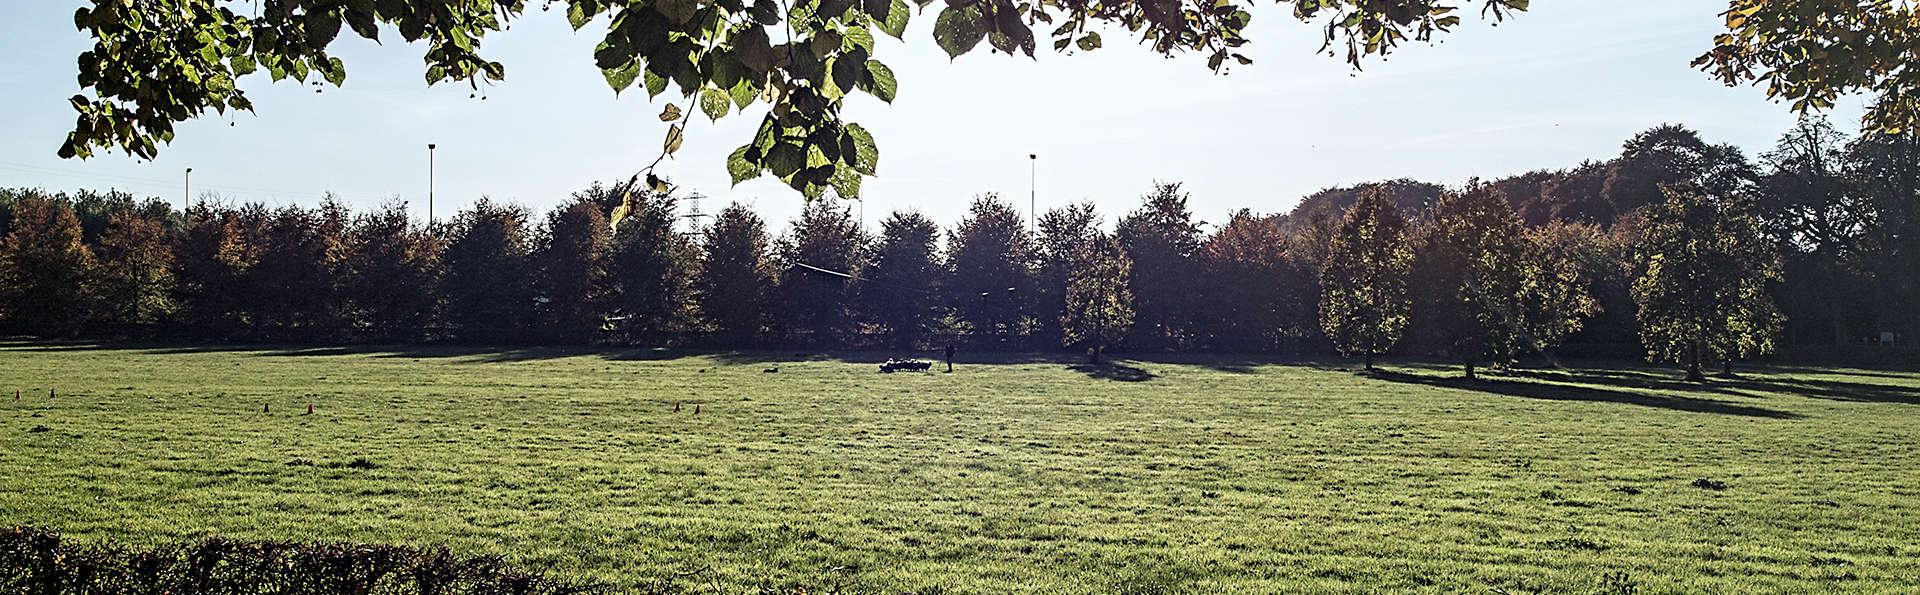 Buitenplaats Vaeshartelt - edit_surroundings2.jpg